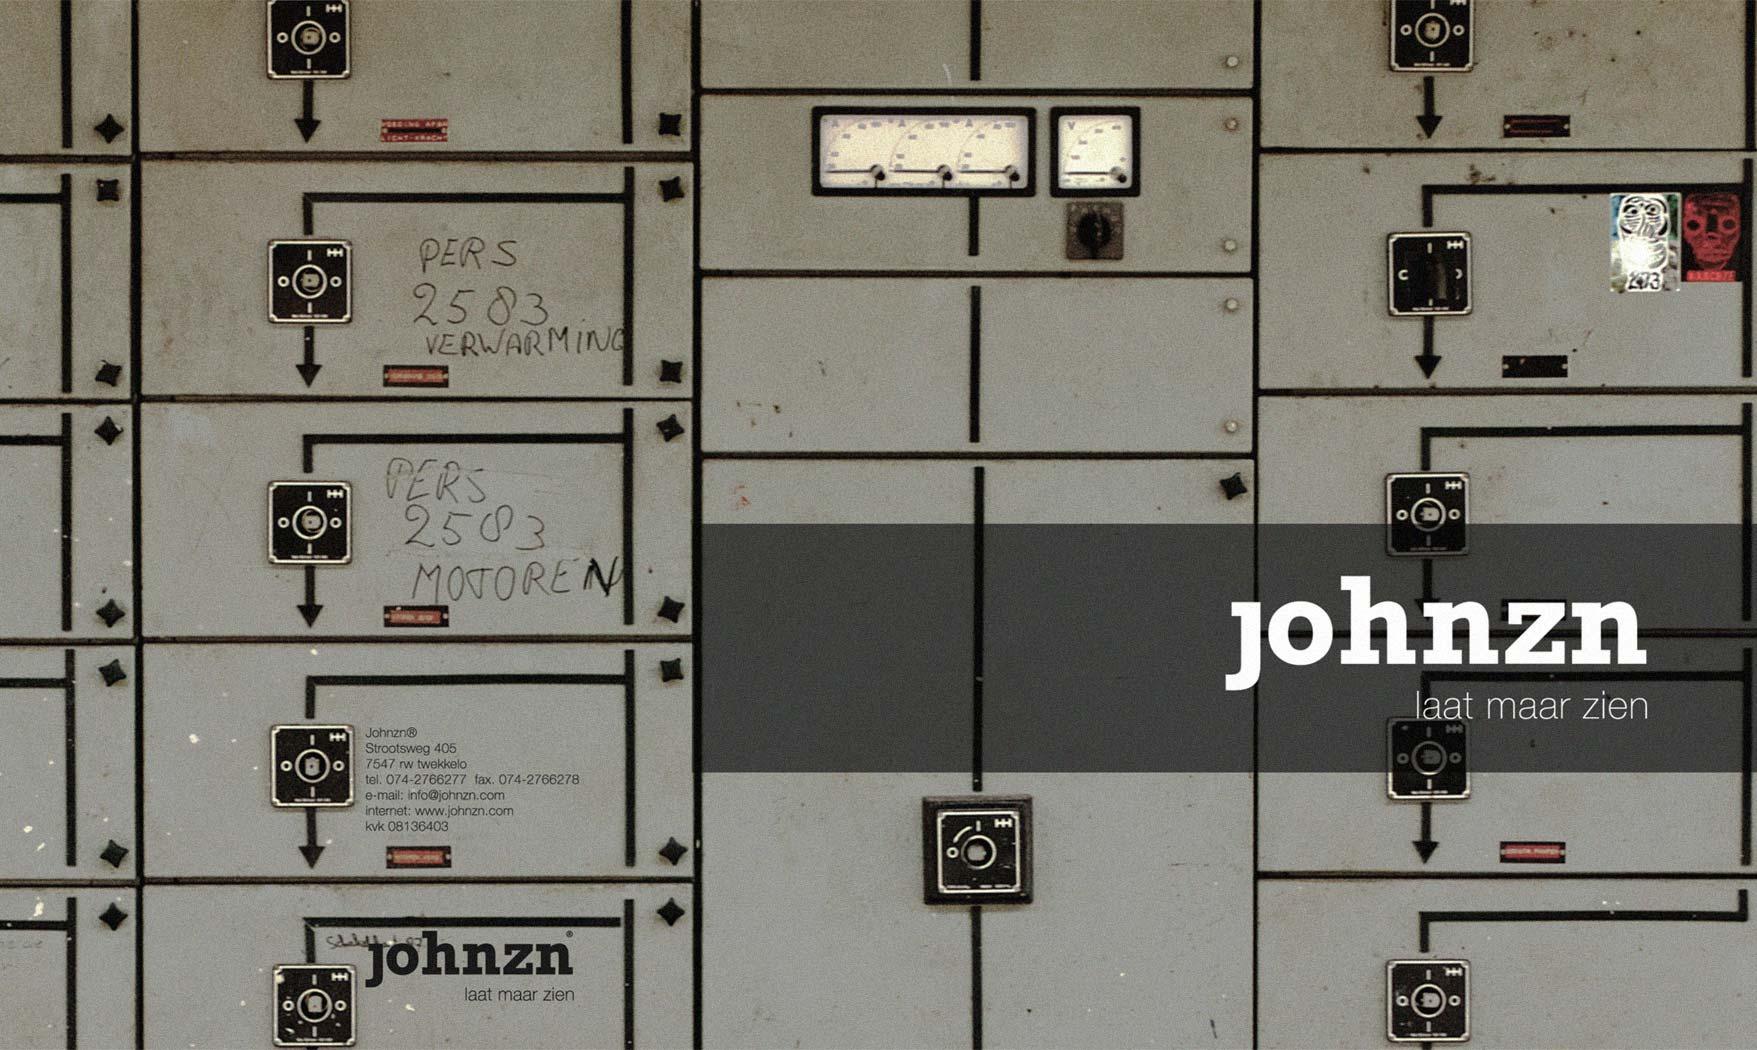 johnzn1-40